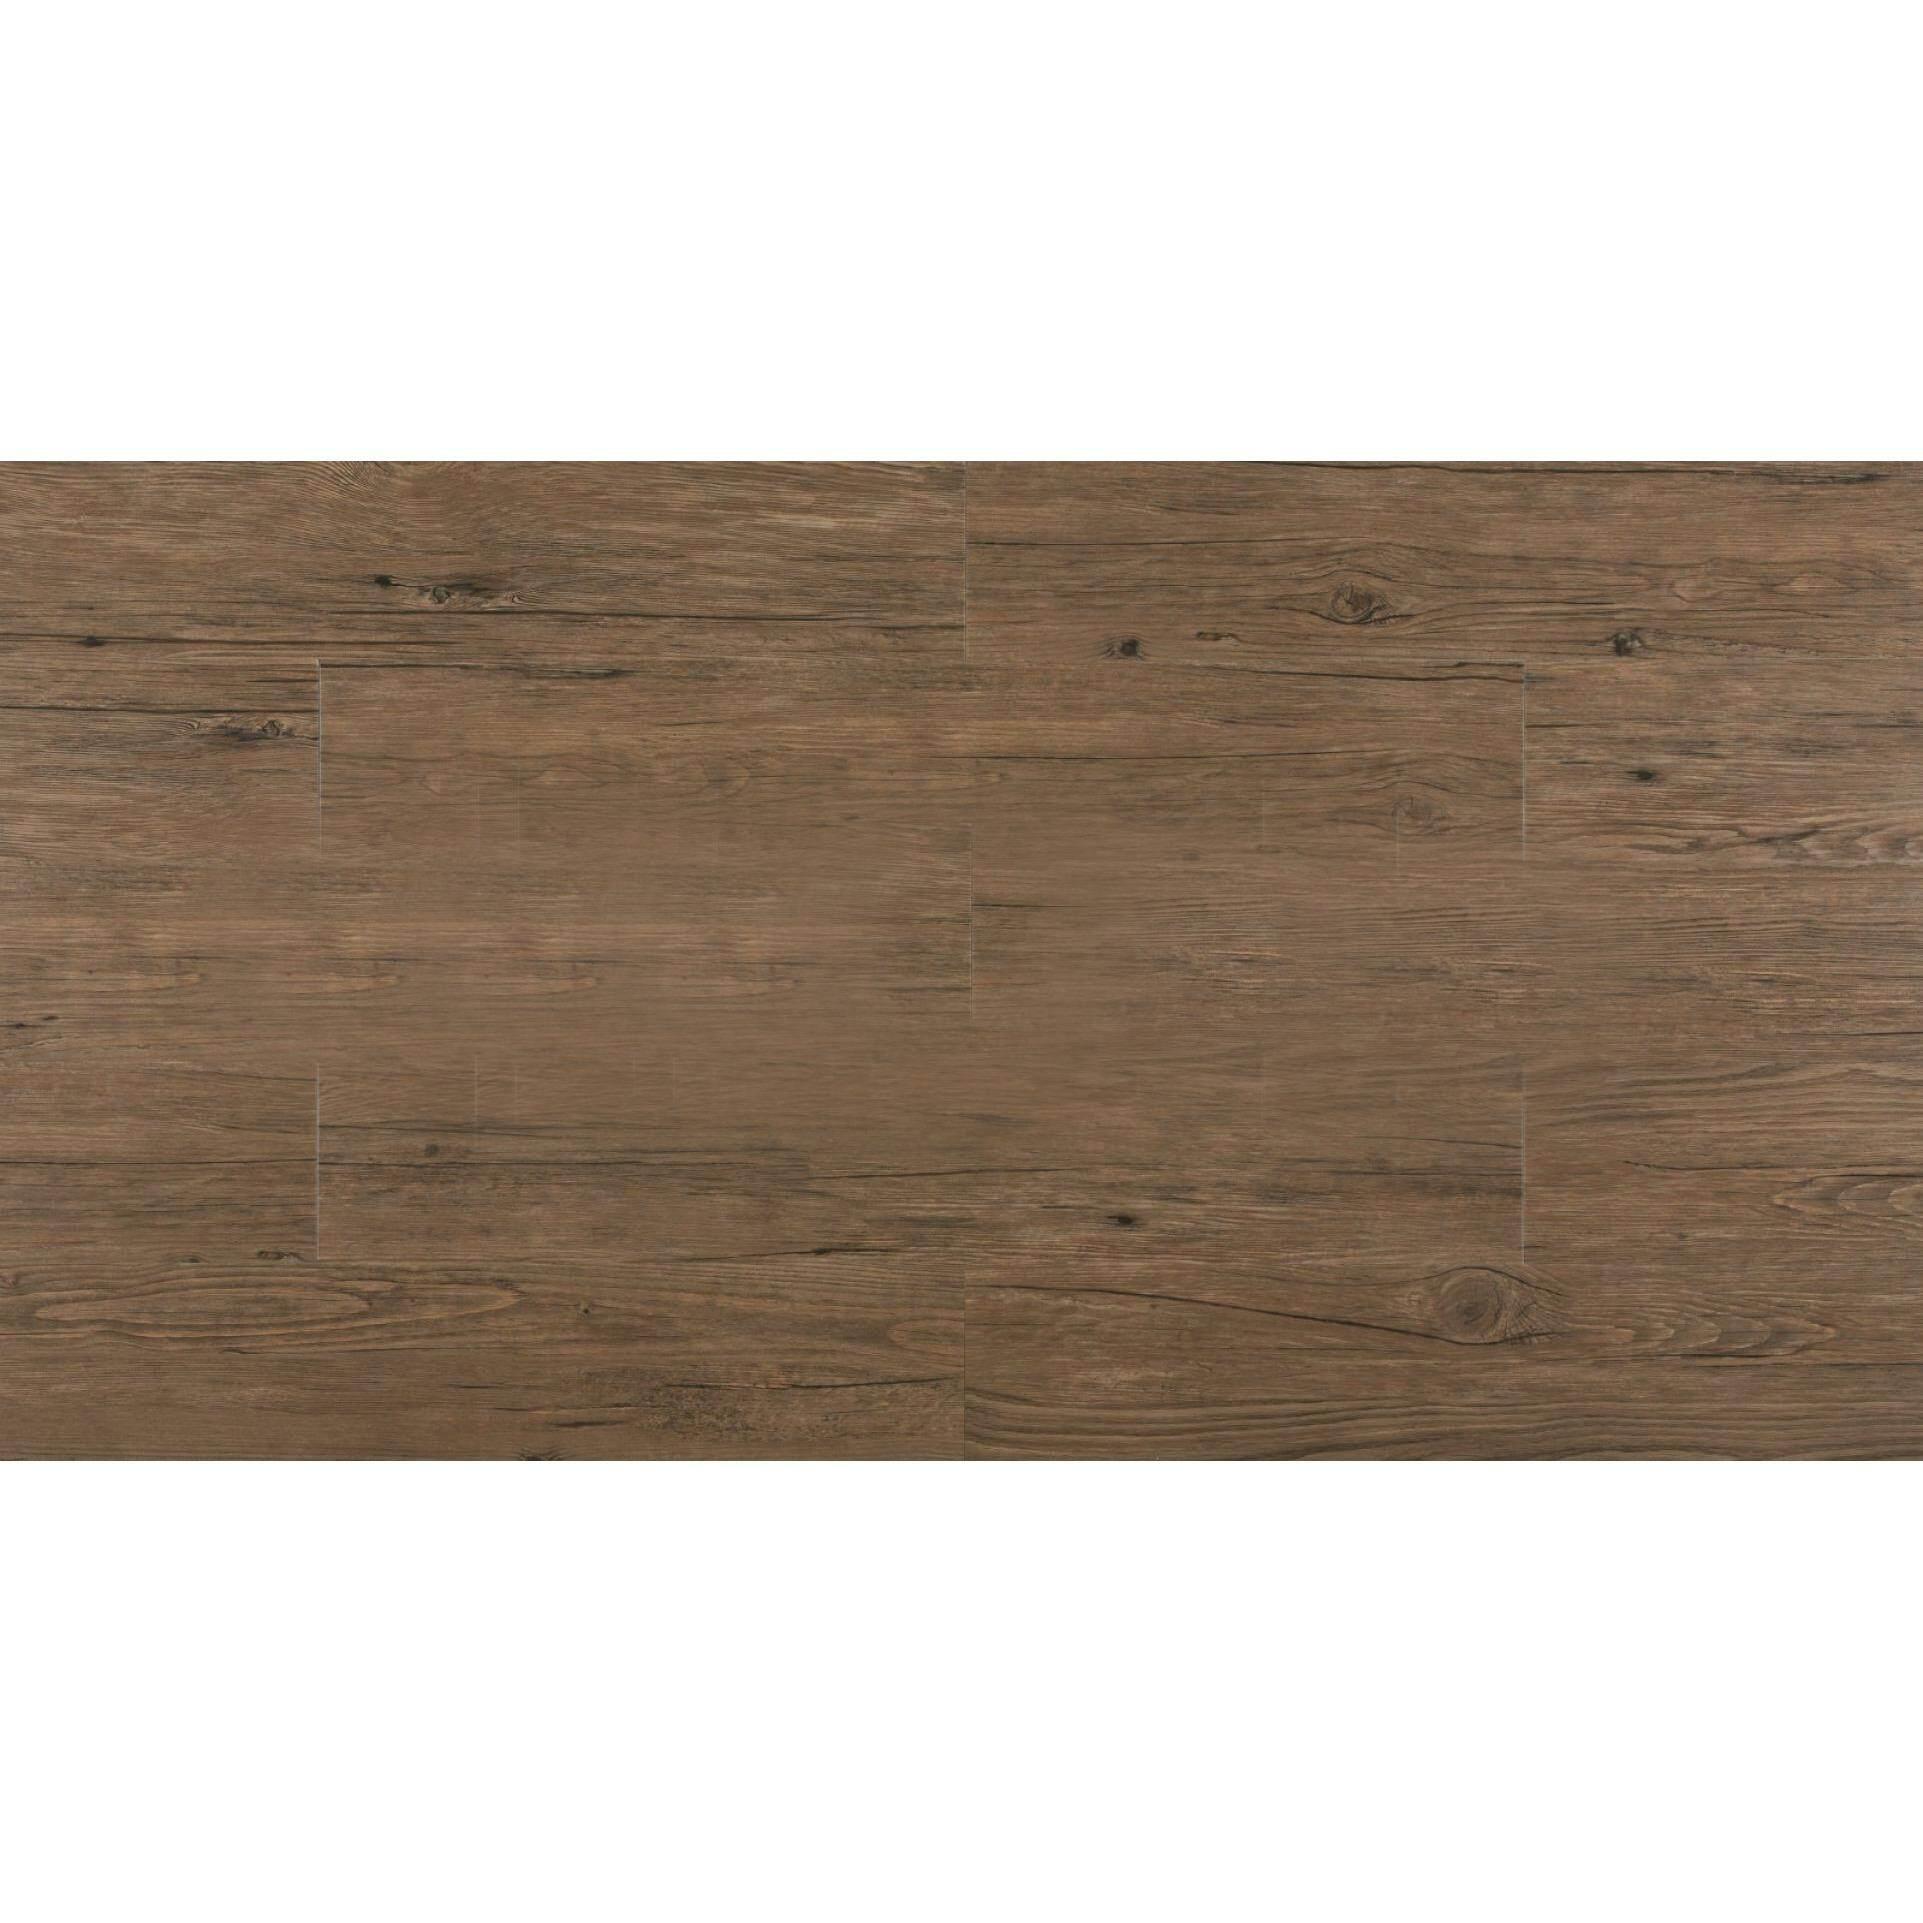 Premium Teraflor Vinyl Tiles Floor 2mm (Box of 20pcs) - Wood - Weather Pine